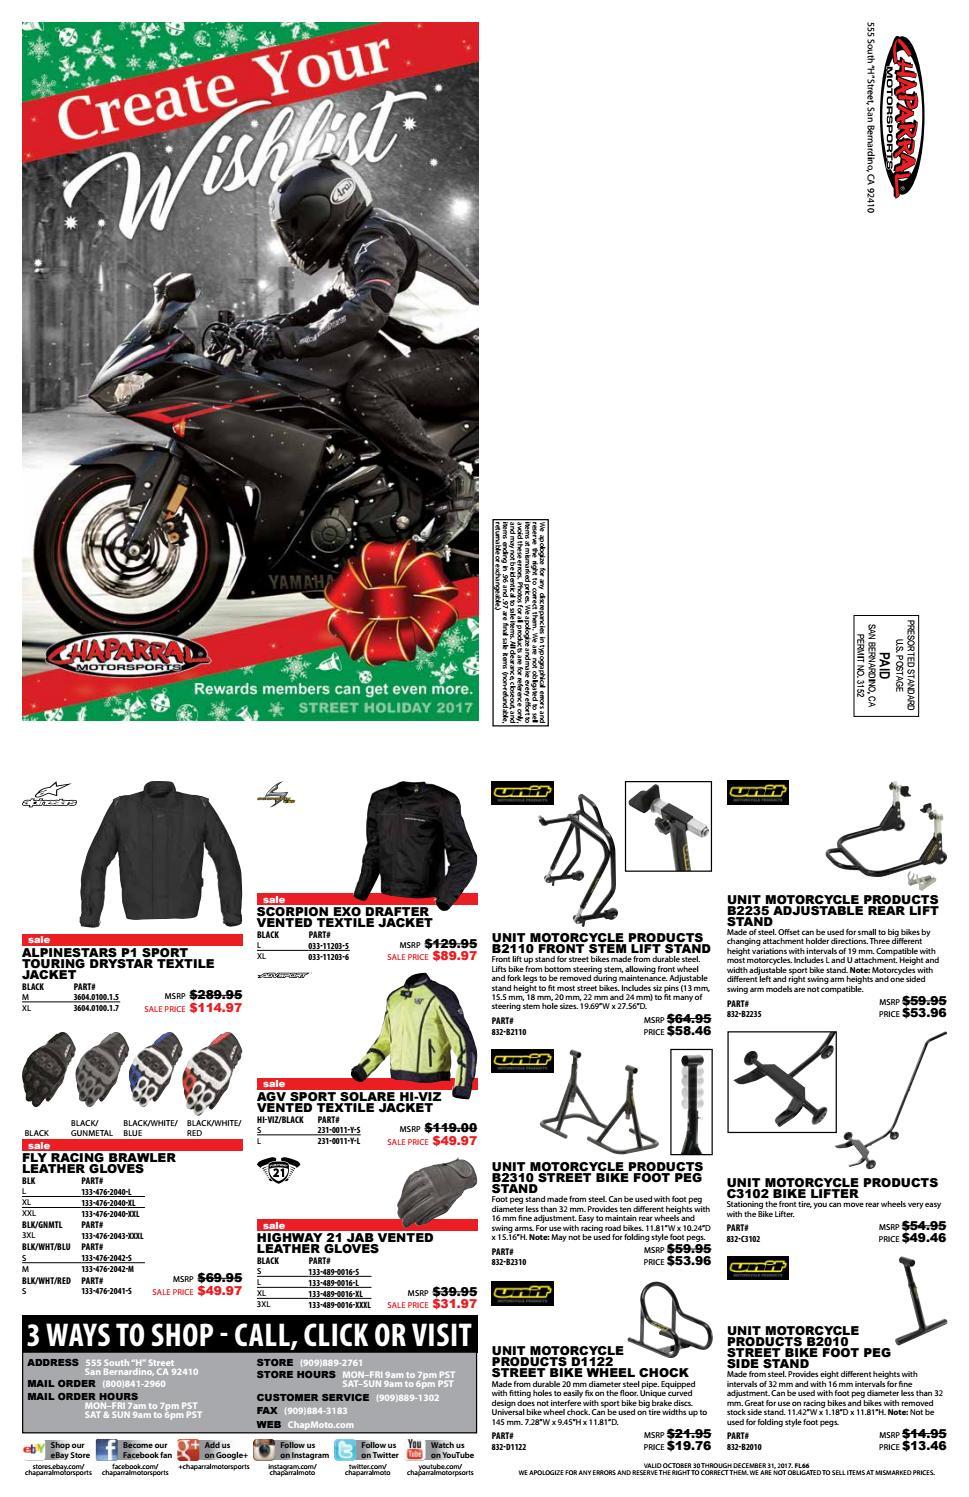 a9634258 Chaparral Chaparral Motorsports 2017 Street Bike Christmas Wish List Flyer  by ChapMoto.com | TwoWheelMania - issuu